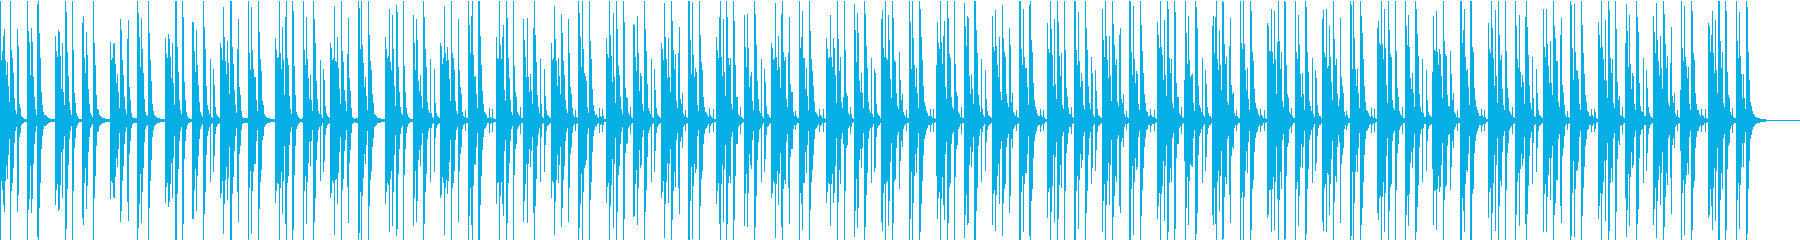 youtube・料理・ピアノ&ピチカートの再生済みの波形